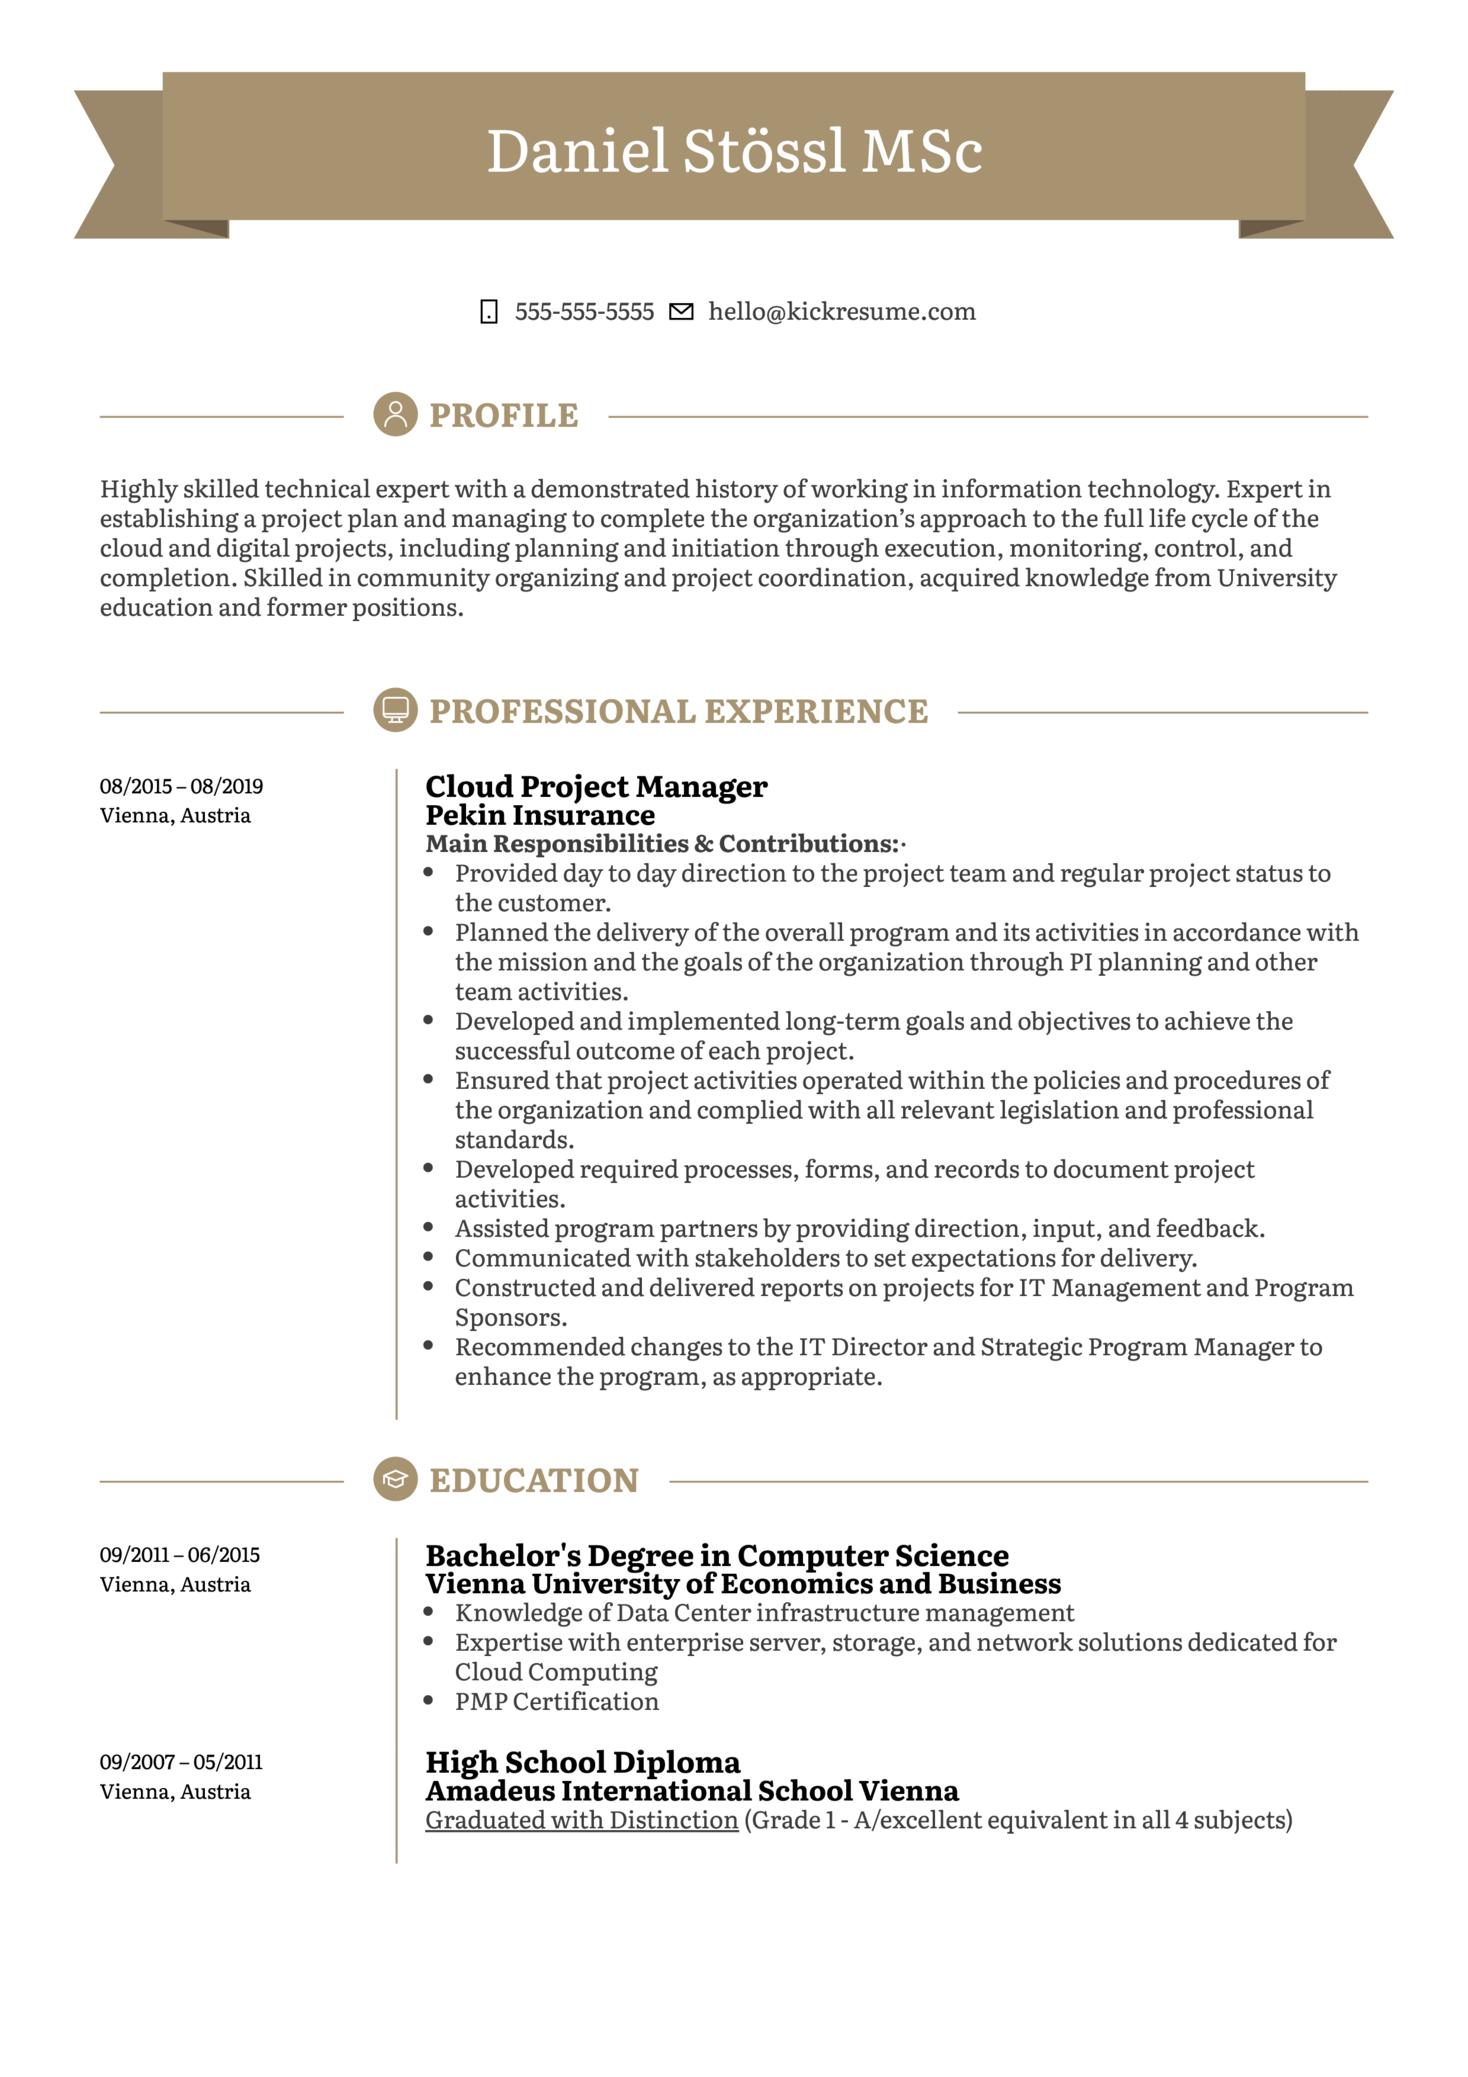 Cloud Project Manager Resume Sample (časť 1)